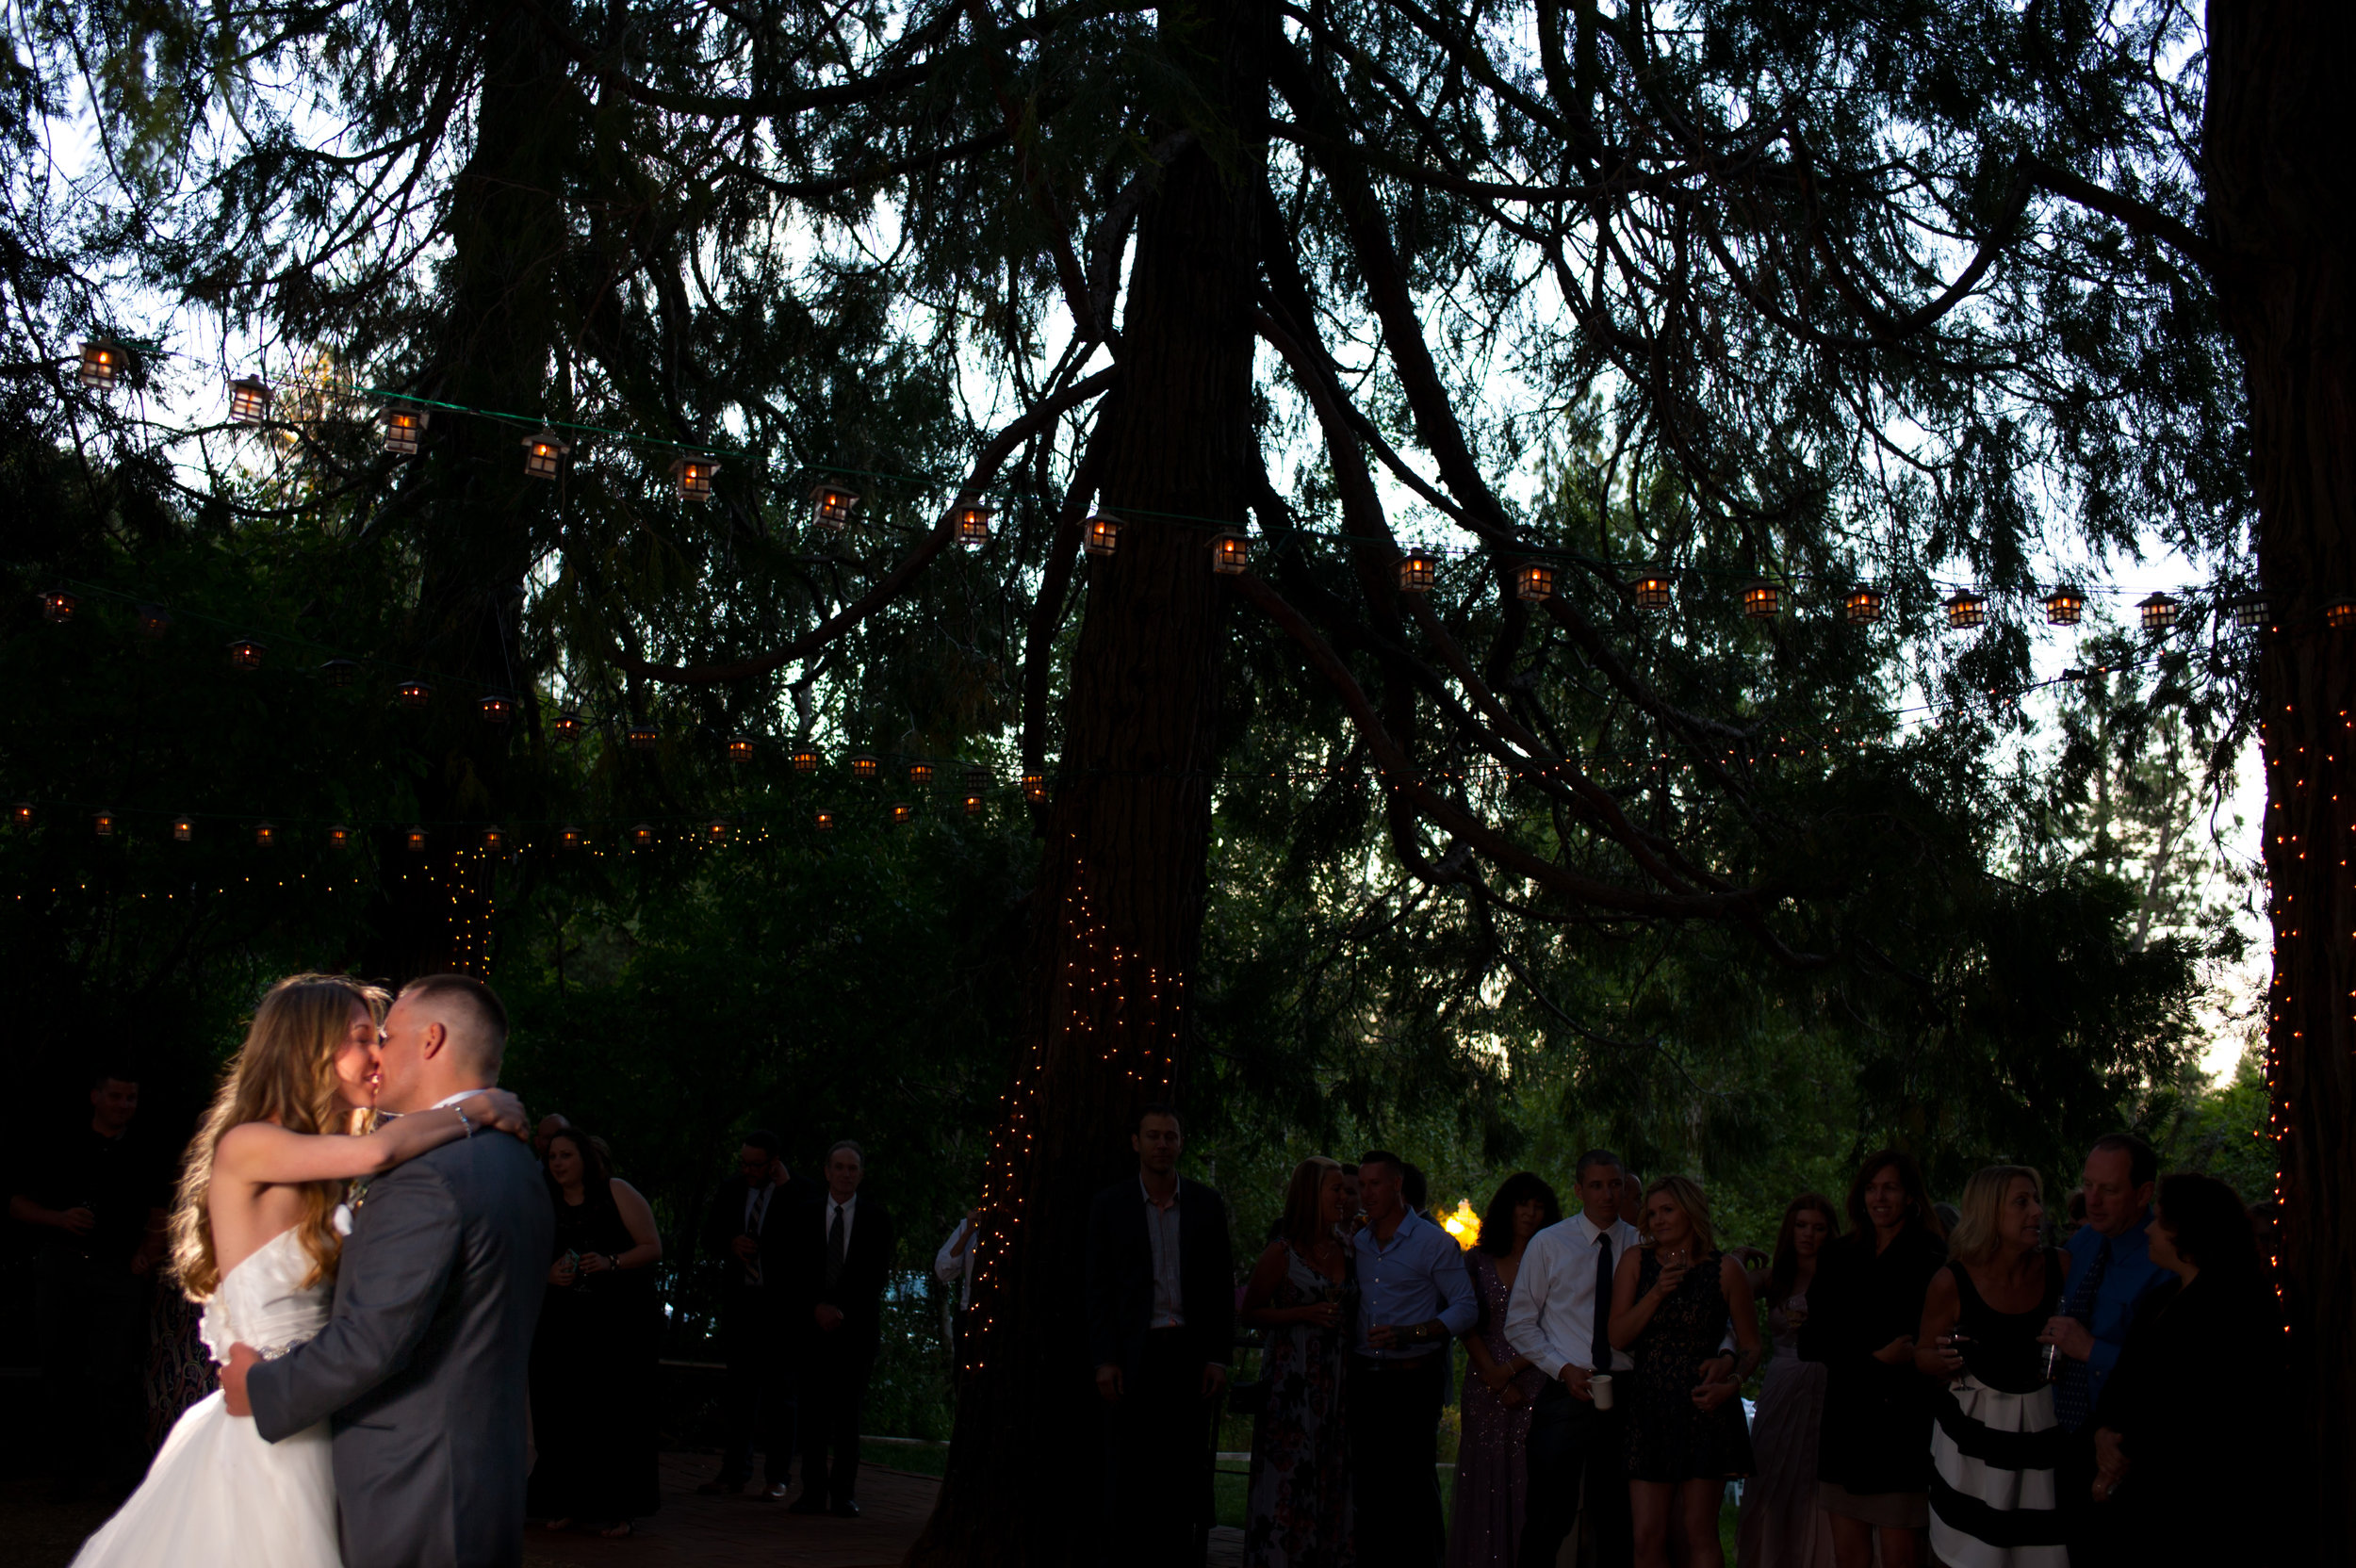 nicole-luke-035-onte-verde-inn-foresthill-wedding-photographer-katherine-nicole-photography.JPG